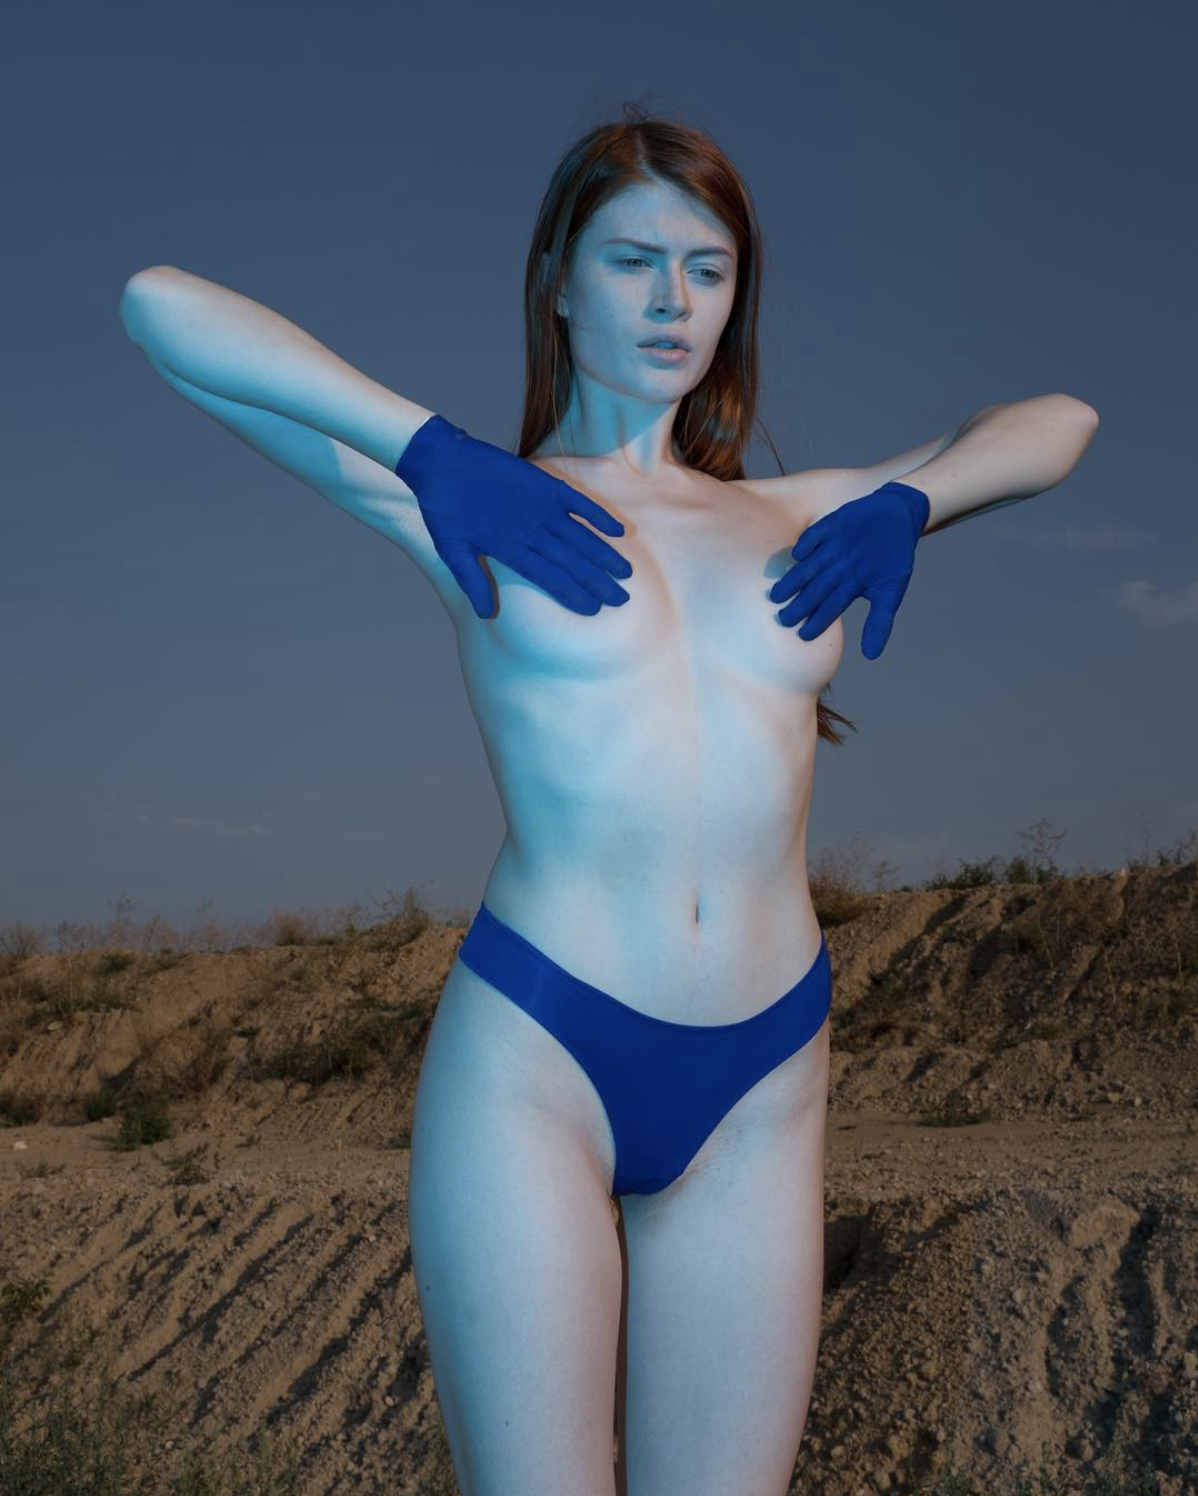 #Uncensored Berlin - With Art by Aja Jane @ BlogFabrikThe exhibition challenging social media censorship